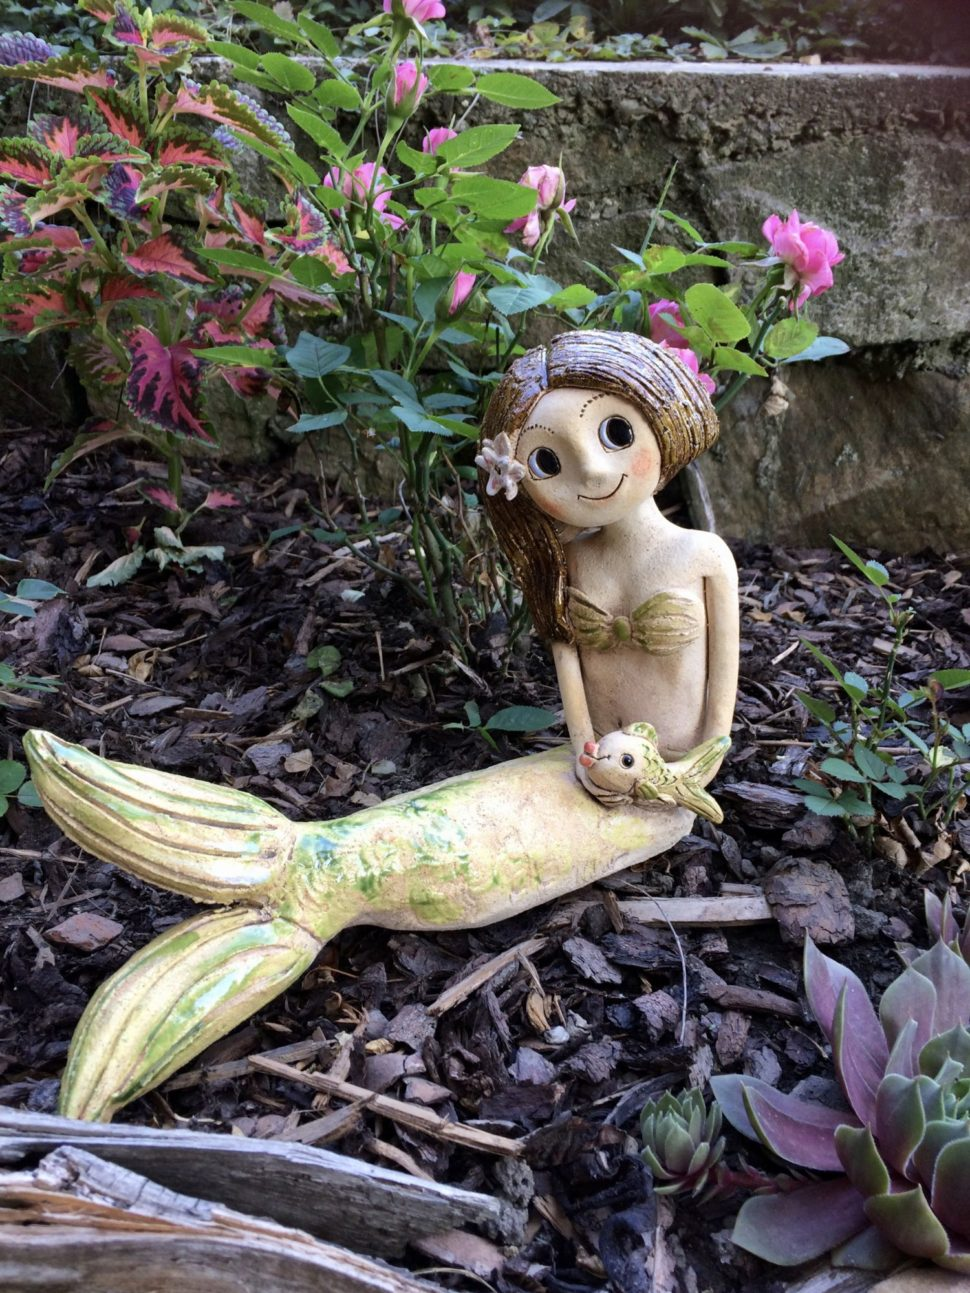 vodní víla mořská panna rybka keramika andee